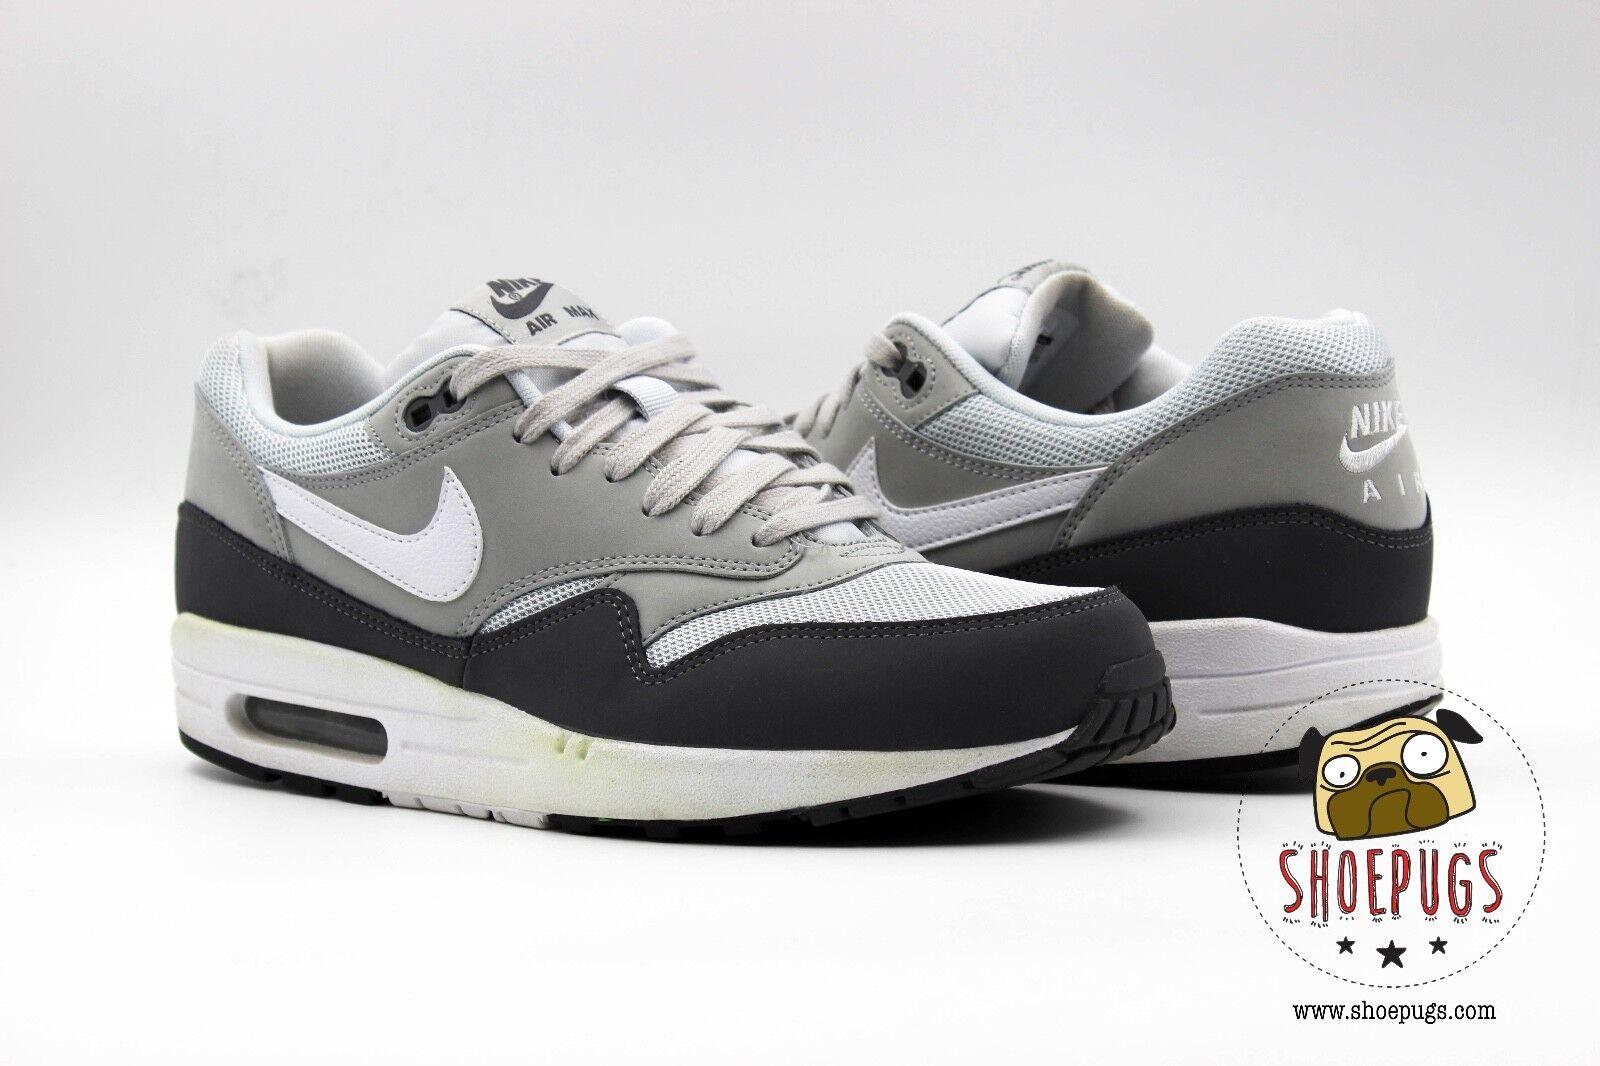 Nike Air Max 1 Essential size 9.5 9.5 9.5 w  Box dark grey white   Fast Shipping  8eec9c